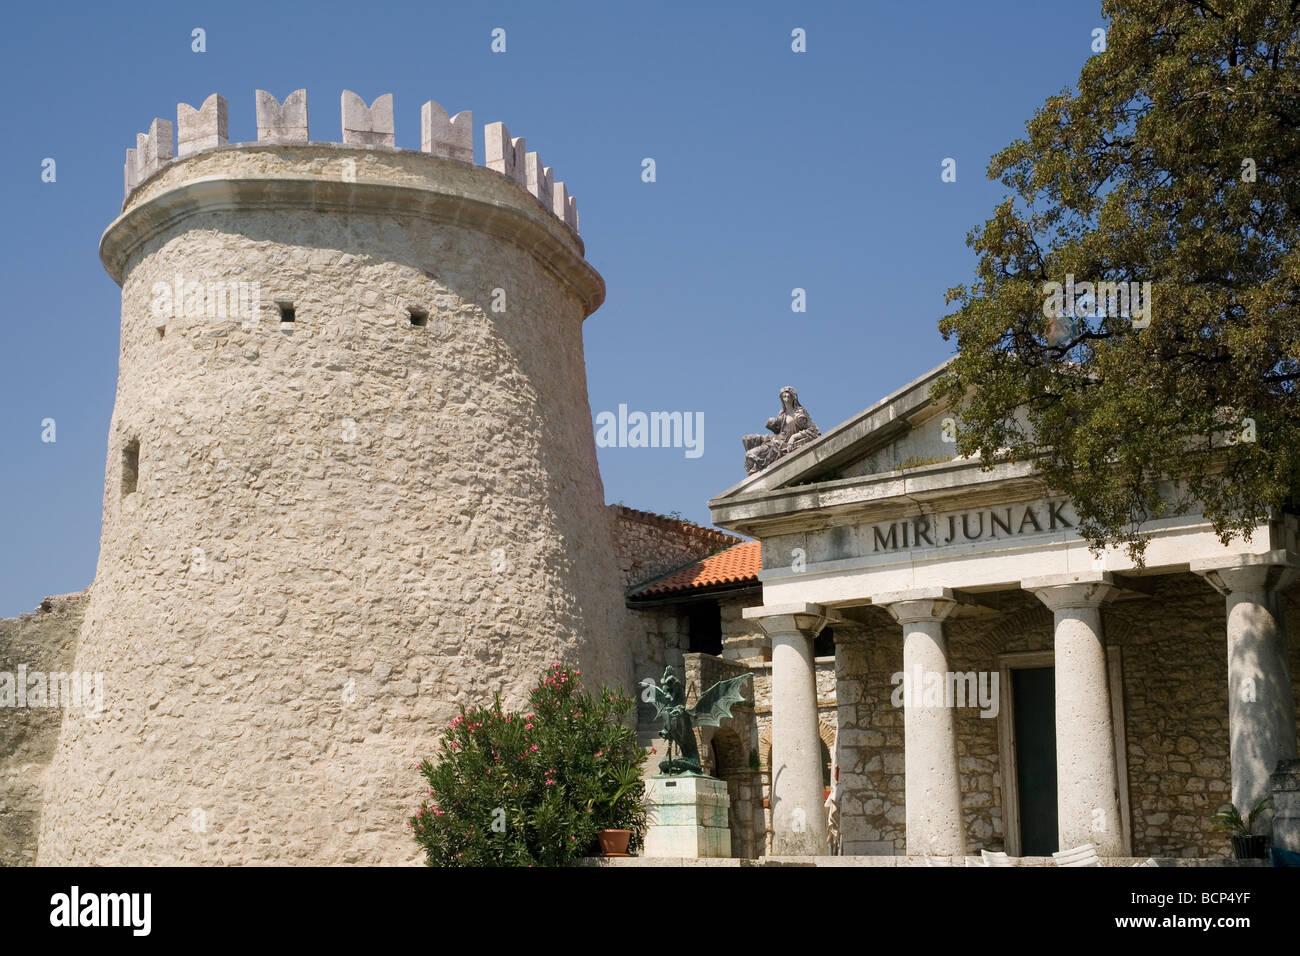 Croatia Rijeka Trsat castle Roman tower - Stock Image